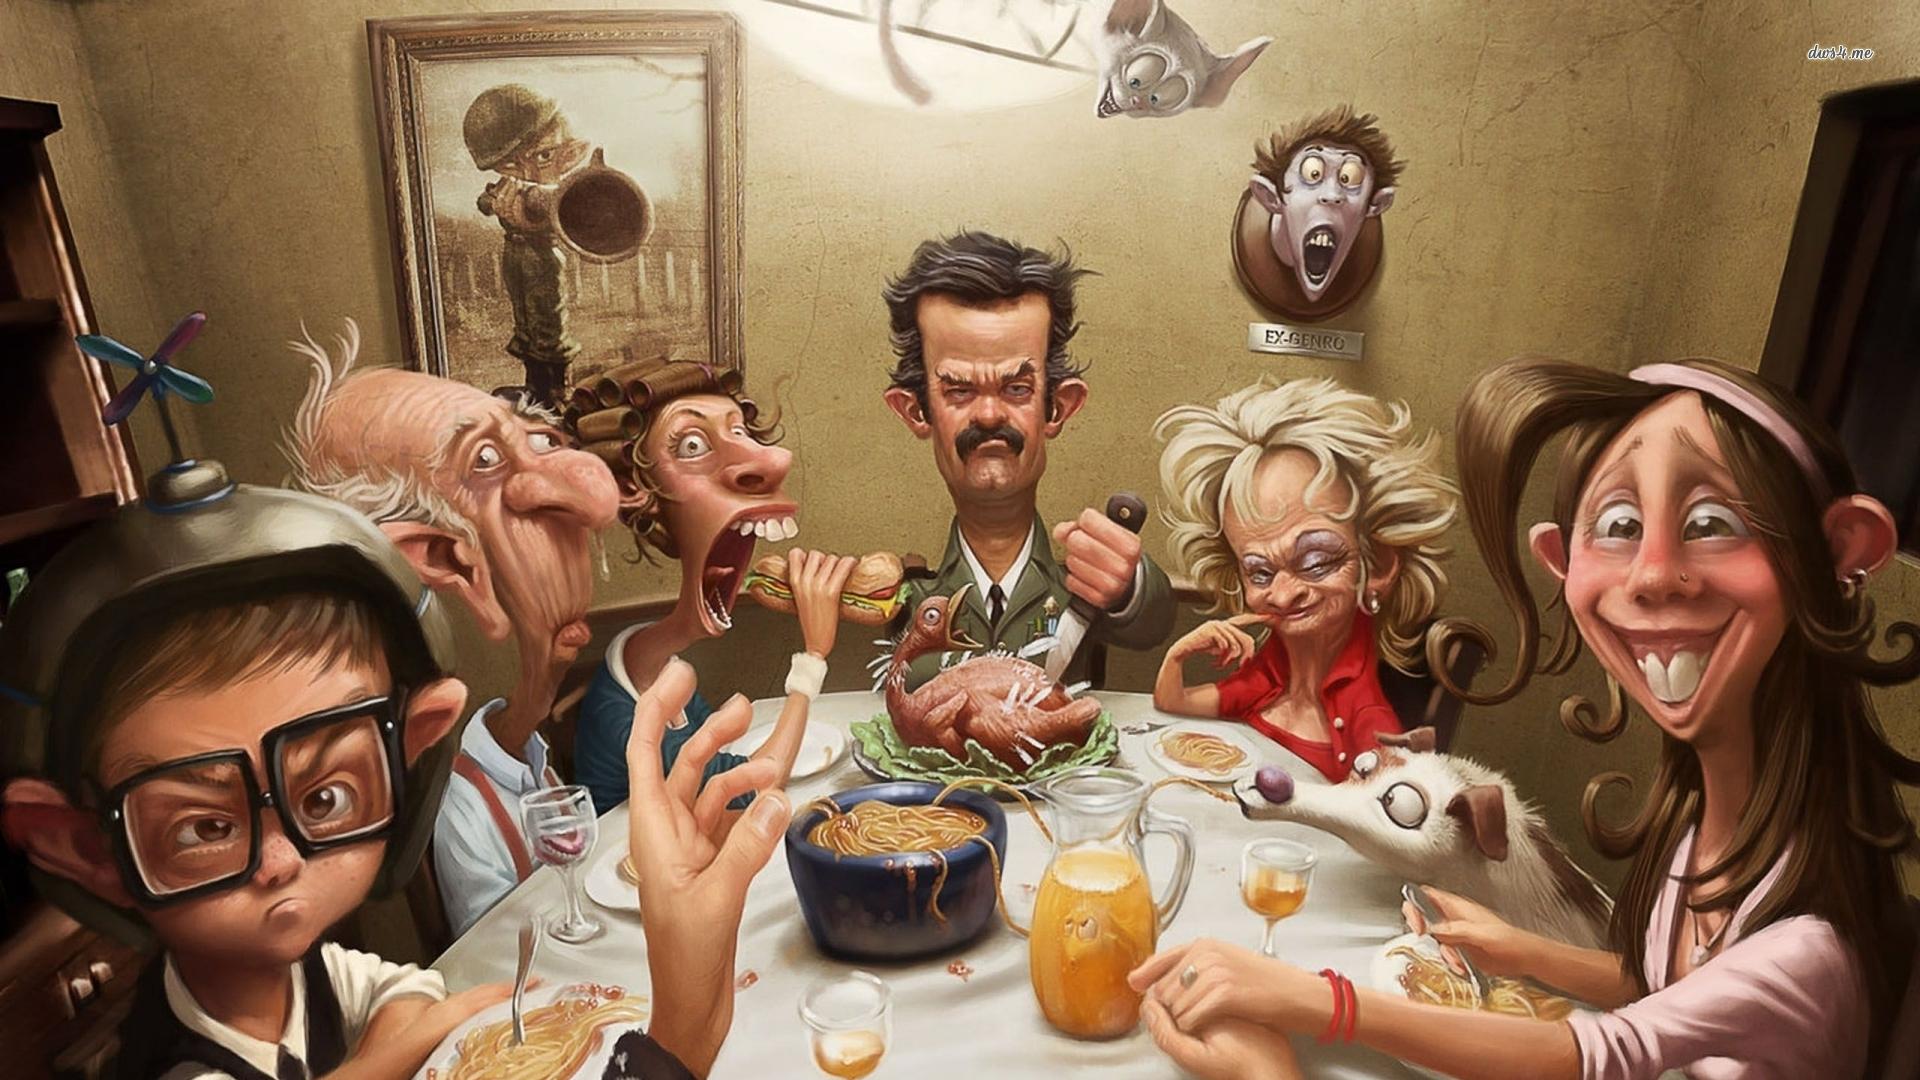 Thanksgiving caricature wallpaper   968729 1920x1080